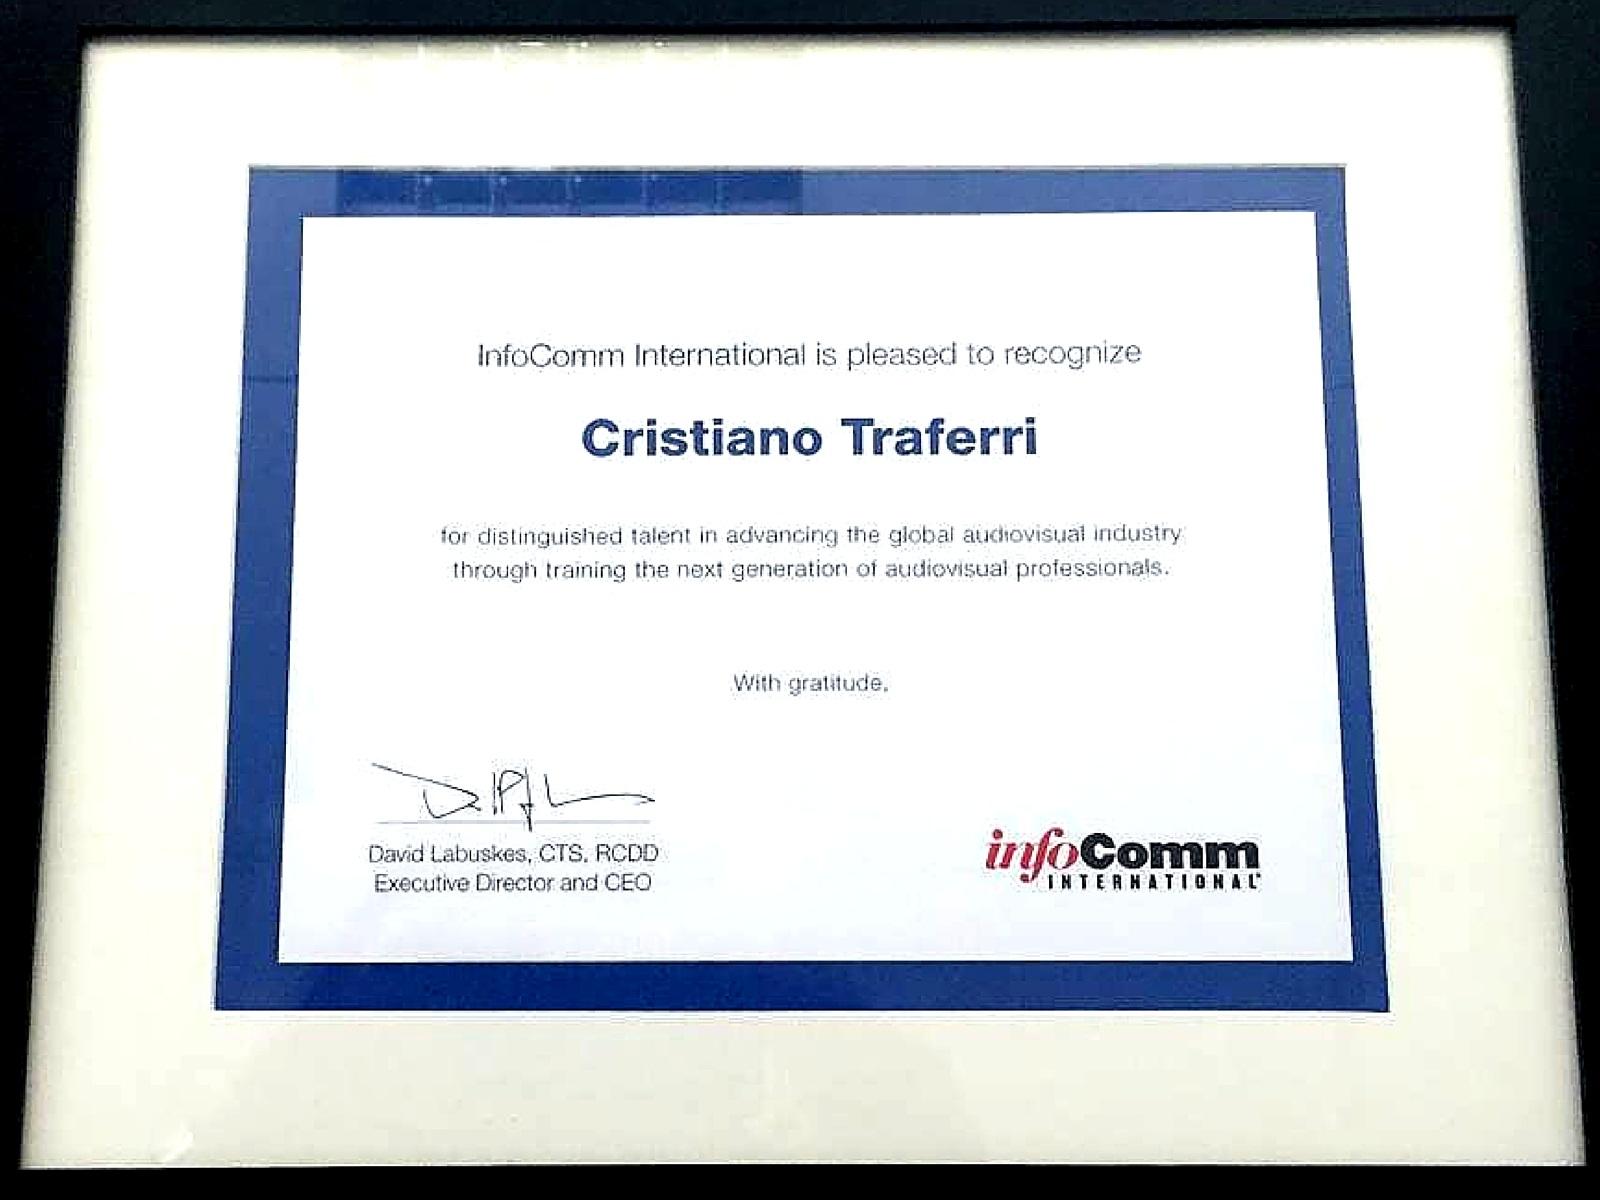 InfoComm recognition